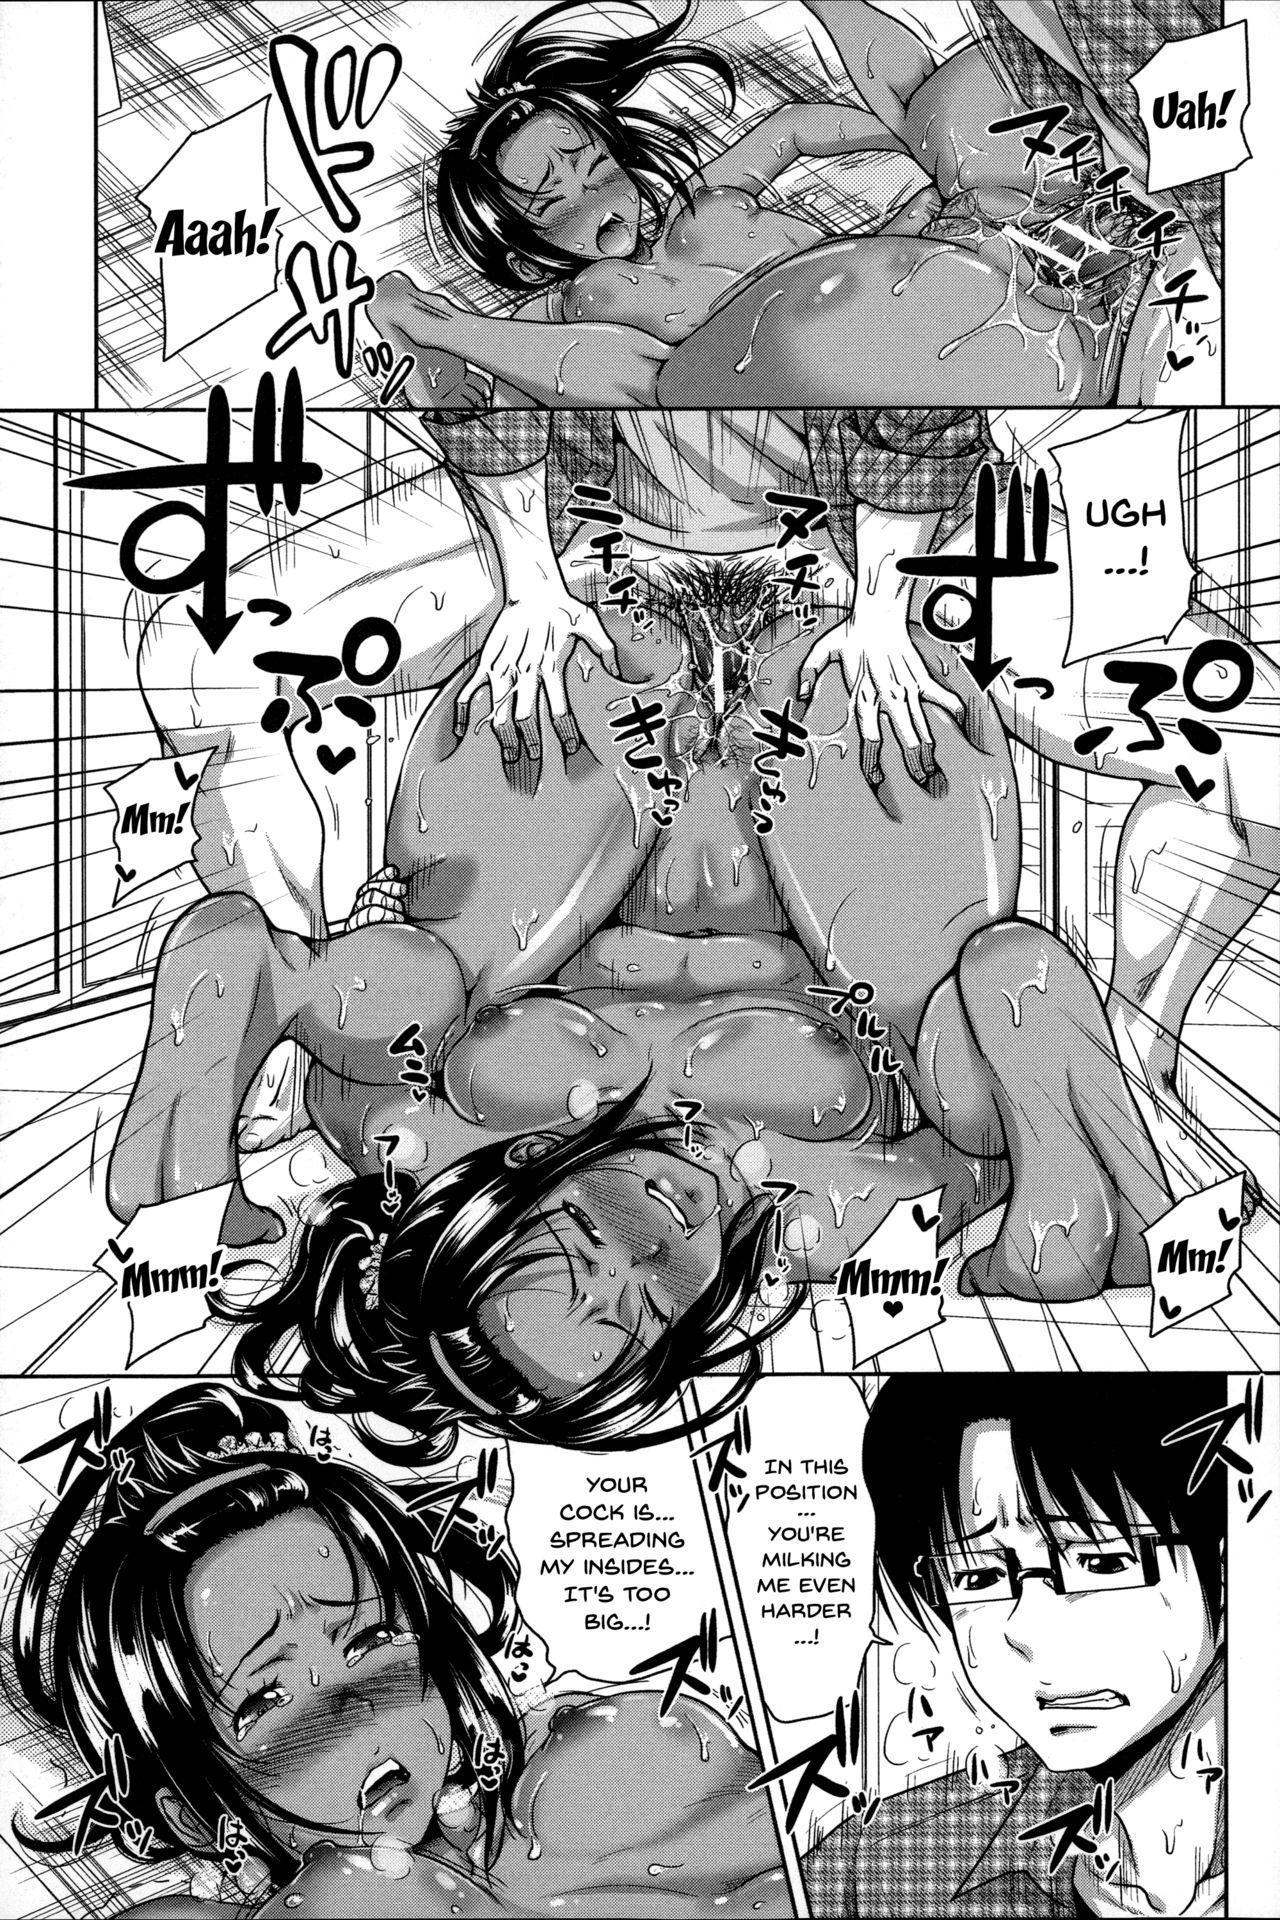 [Takuwan] Pakotate! Seikouritsu 0% no Teppeki Bishojo VS Seikouritsu 100% no Hentai Katei Kyoushi   Pakotate! Sex Rate 0% Iron-Willed Beautiful Virgins VS Sex Rate 100% Perverted Coach Ch.1-5 [English] {Doujins.com} 82